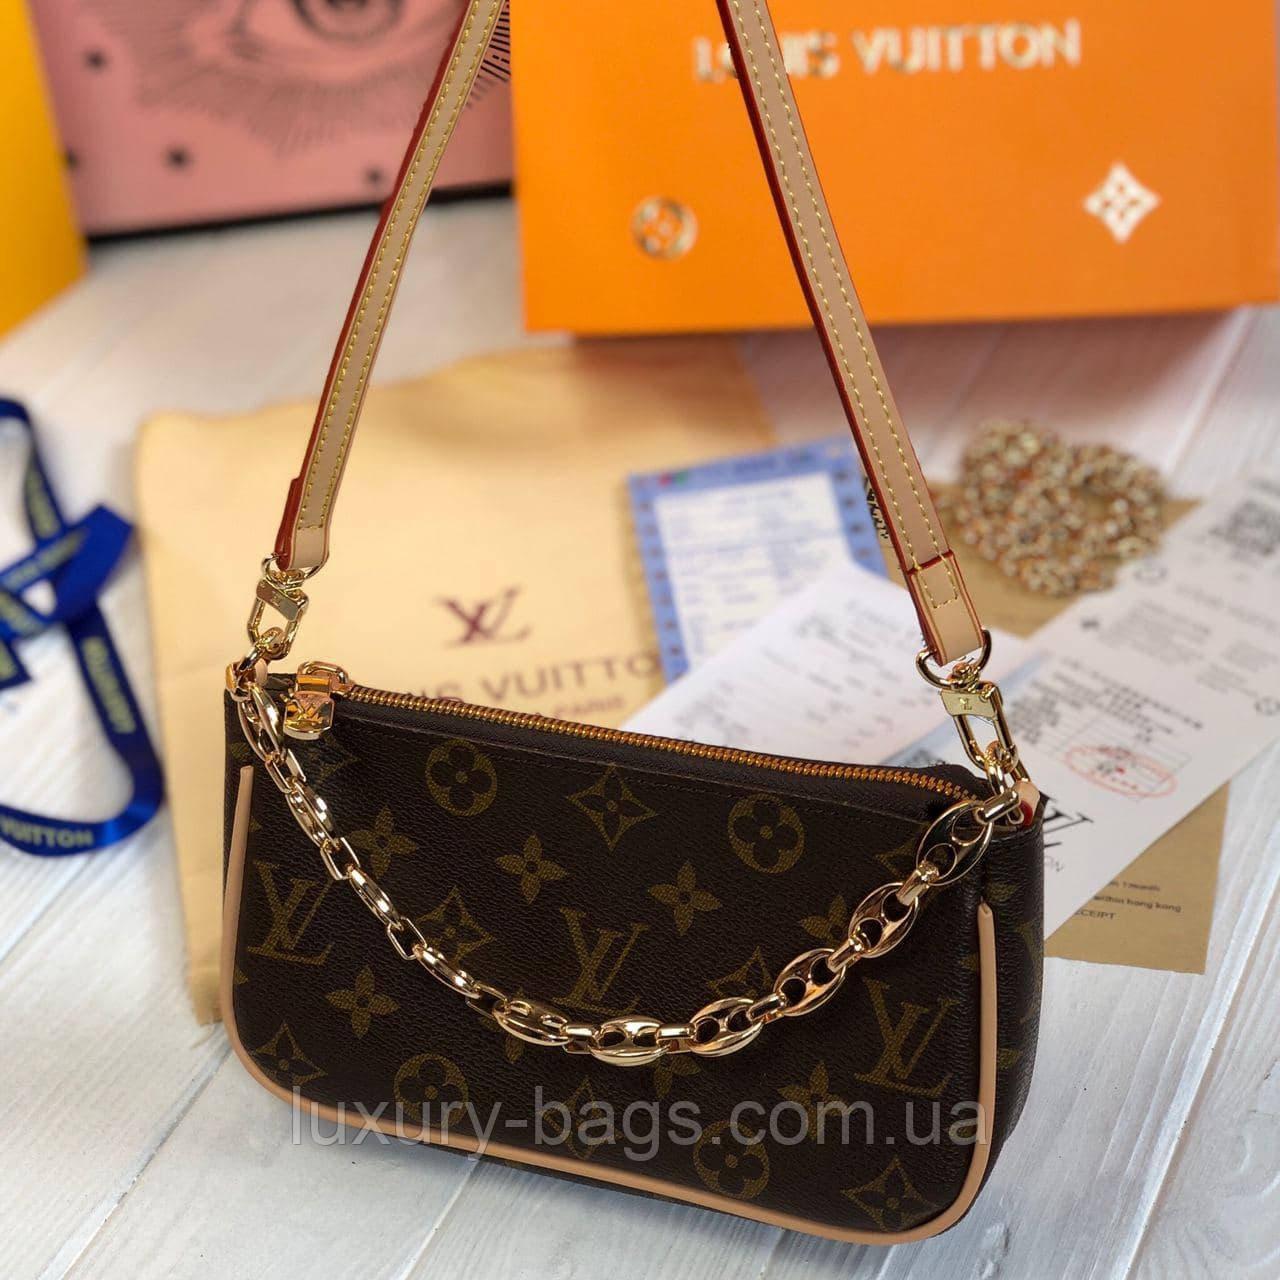 Жіноча маленька сумка Louis Vuitton